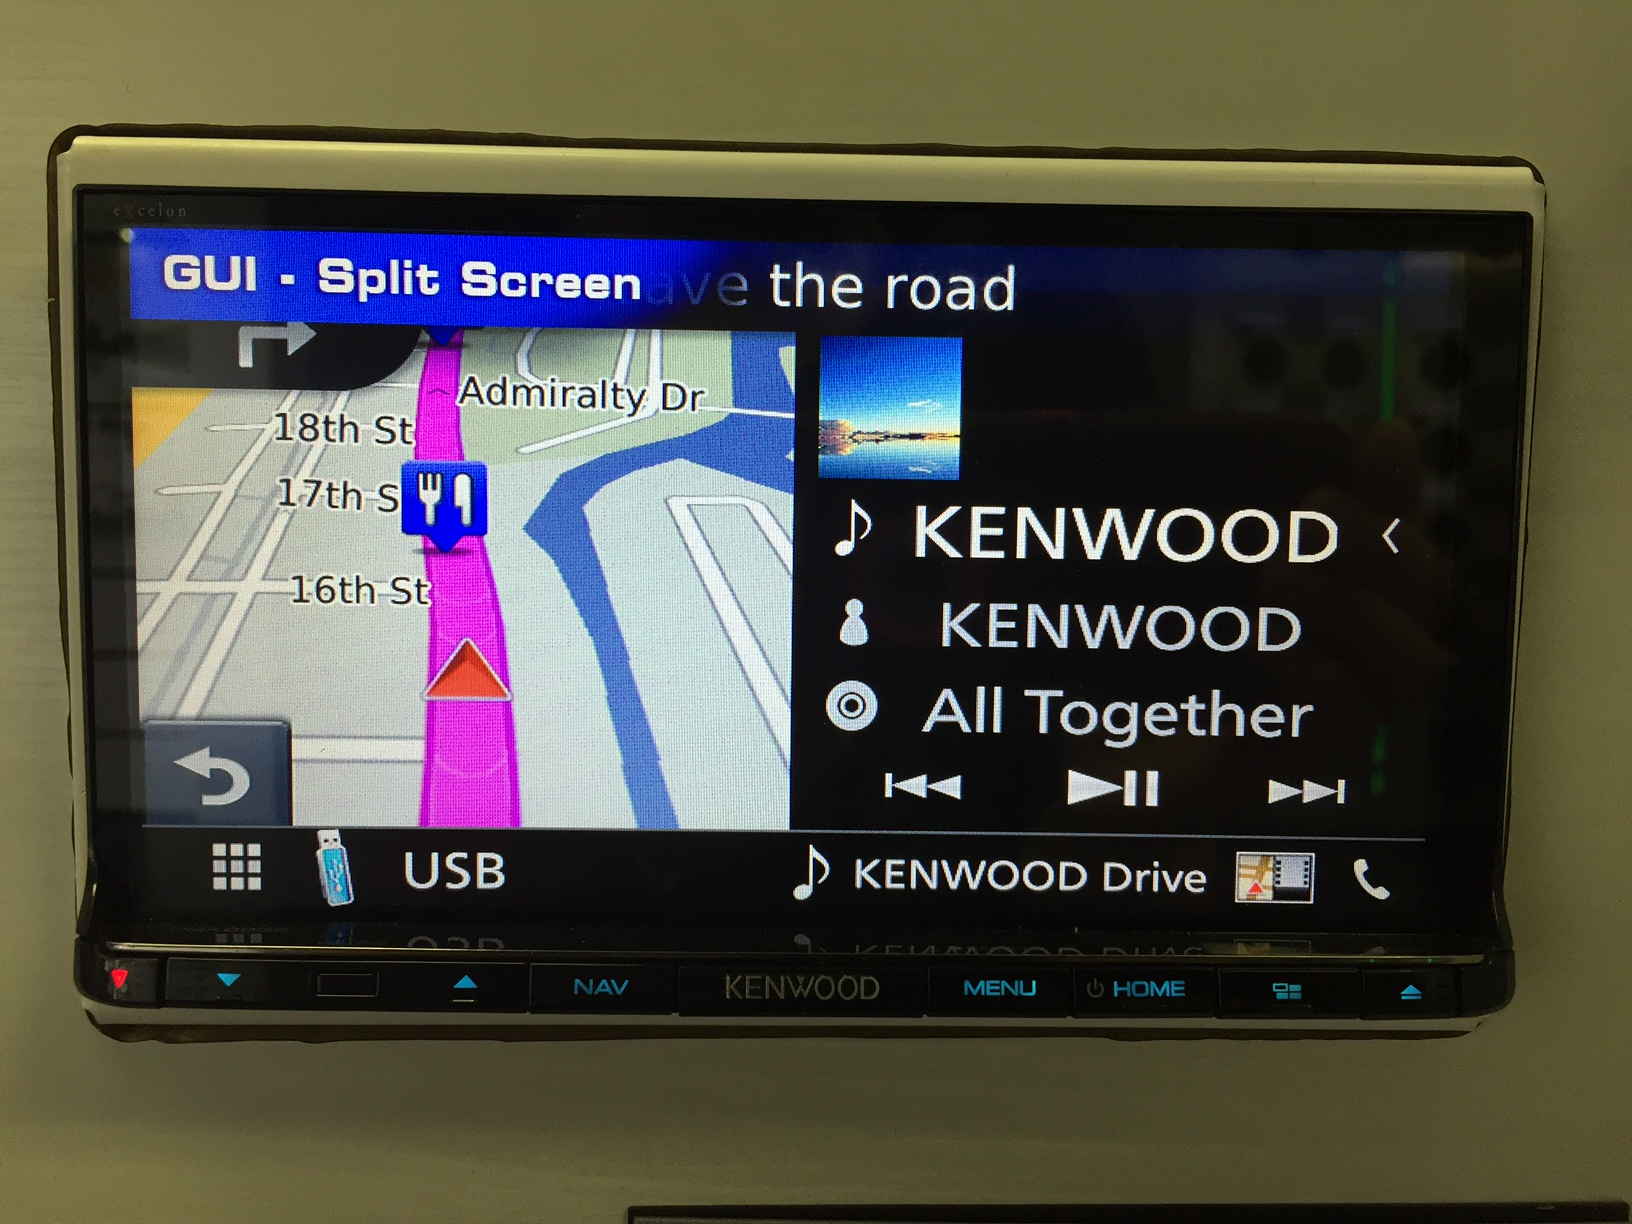 Best Double Din Navigation 2016 - Kenwood DNX893s, Alpine